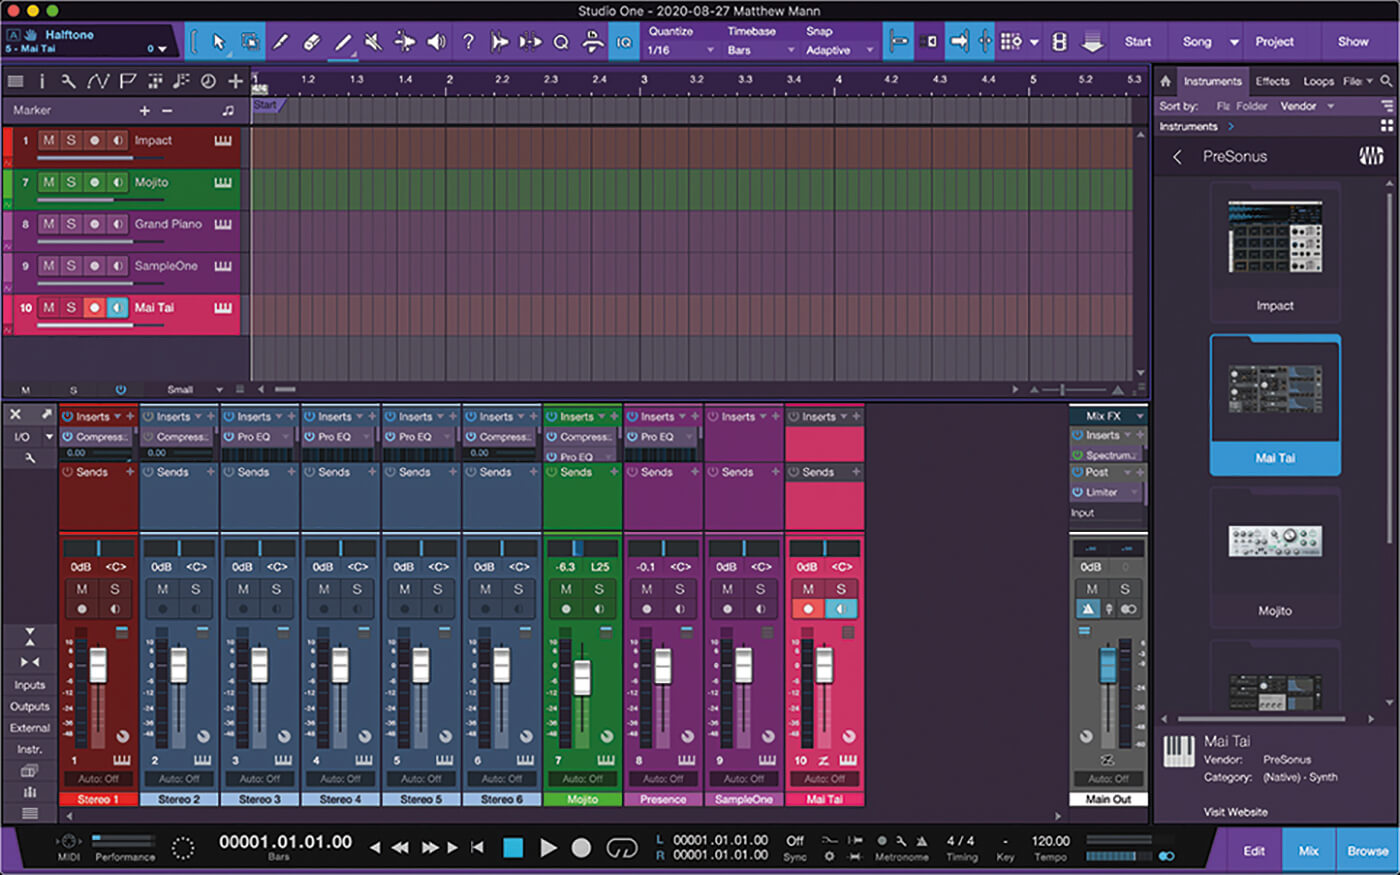 MT211 Studio One 5 Tips 9